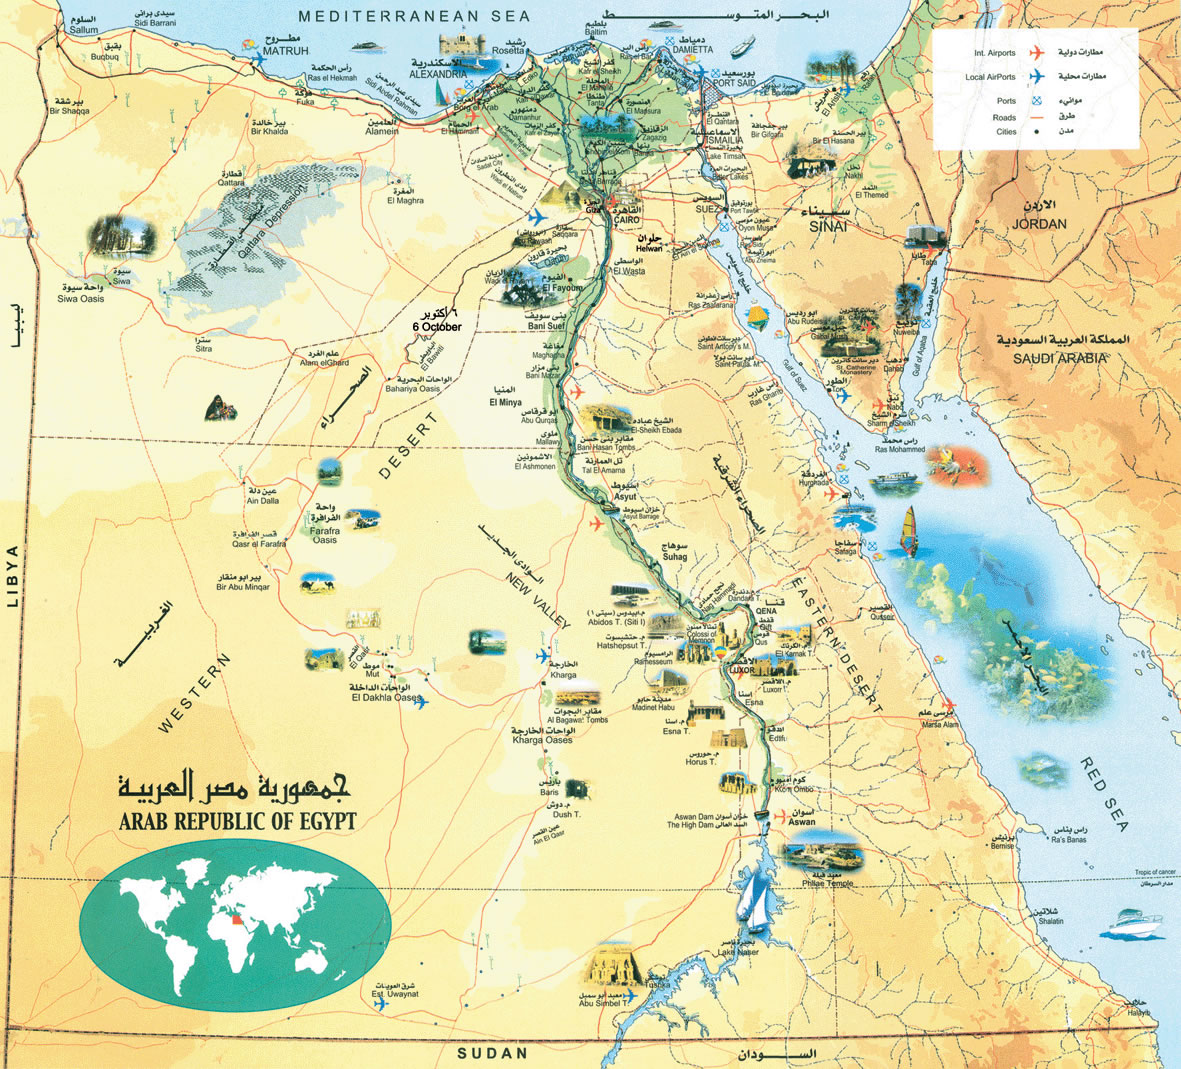 Carte touristique gypte carte touristique de l 39 gypte for Carte touristique